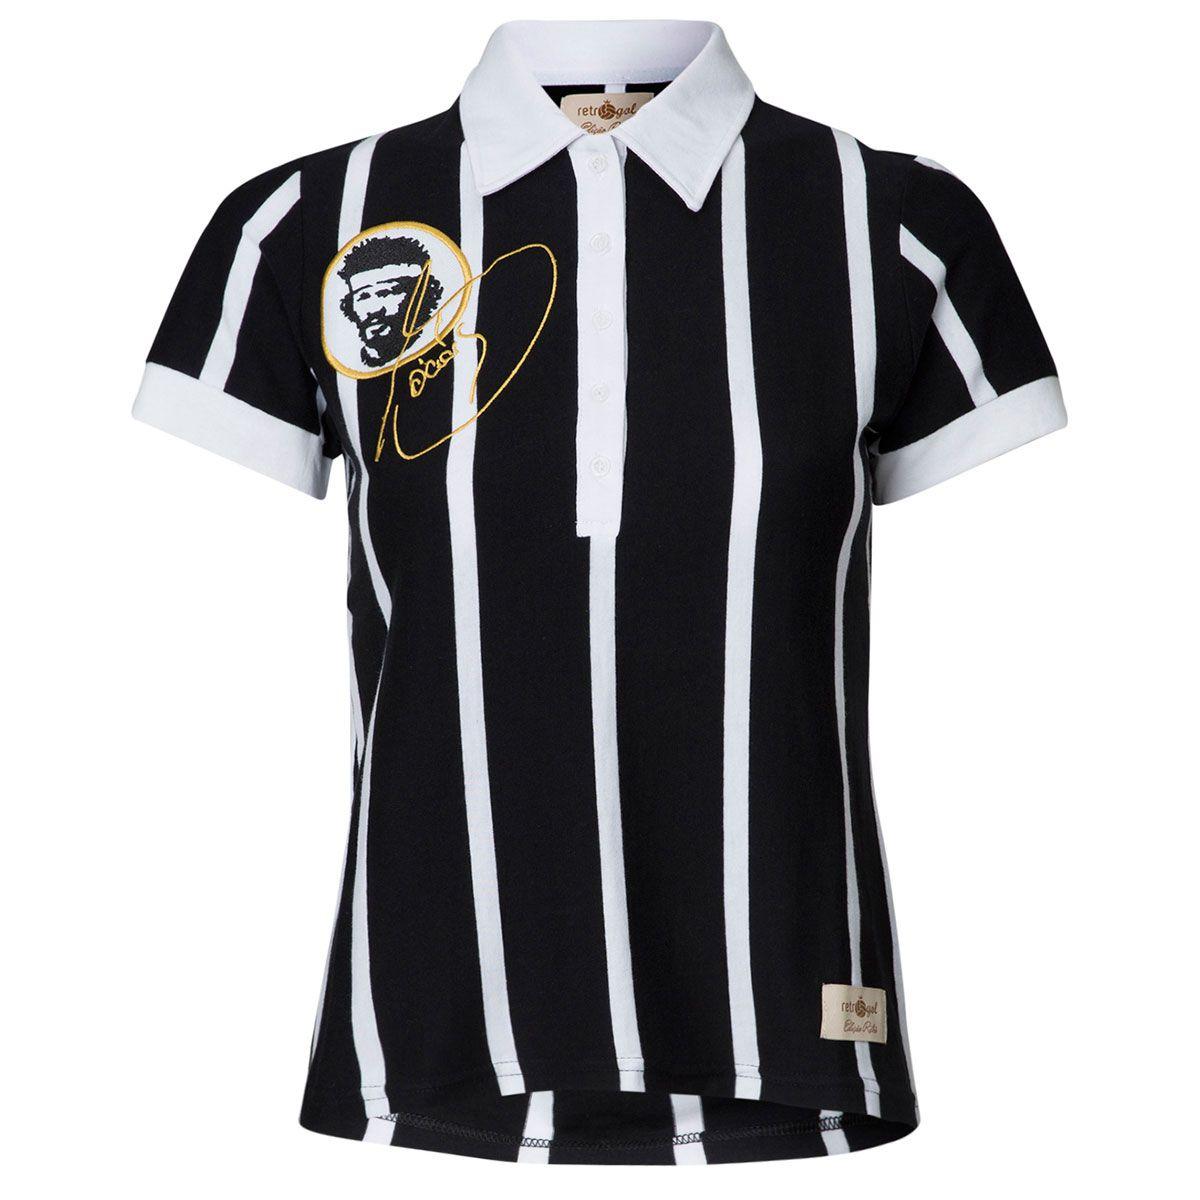 Camisa Feminina Baby Look Retrô Gol Sócrates Ex - Corinthians